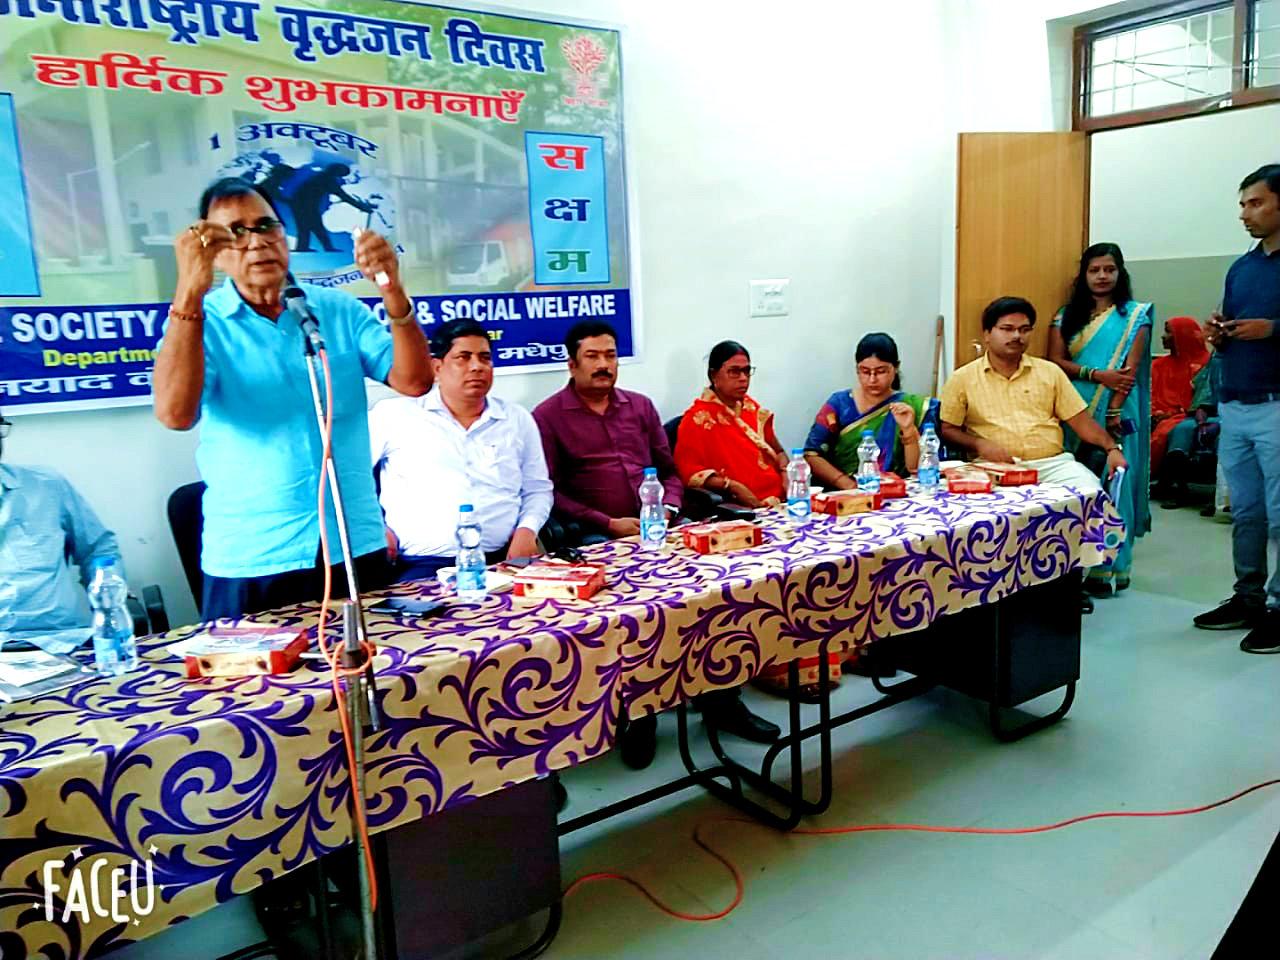 Samajsevi Dr.Bhupendra Madhepuri addressing the people at Buniyad Bhawan, Madhepura.